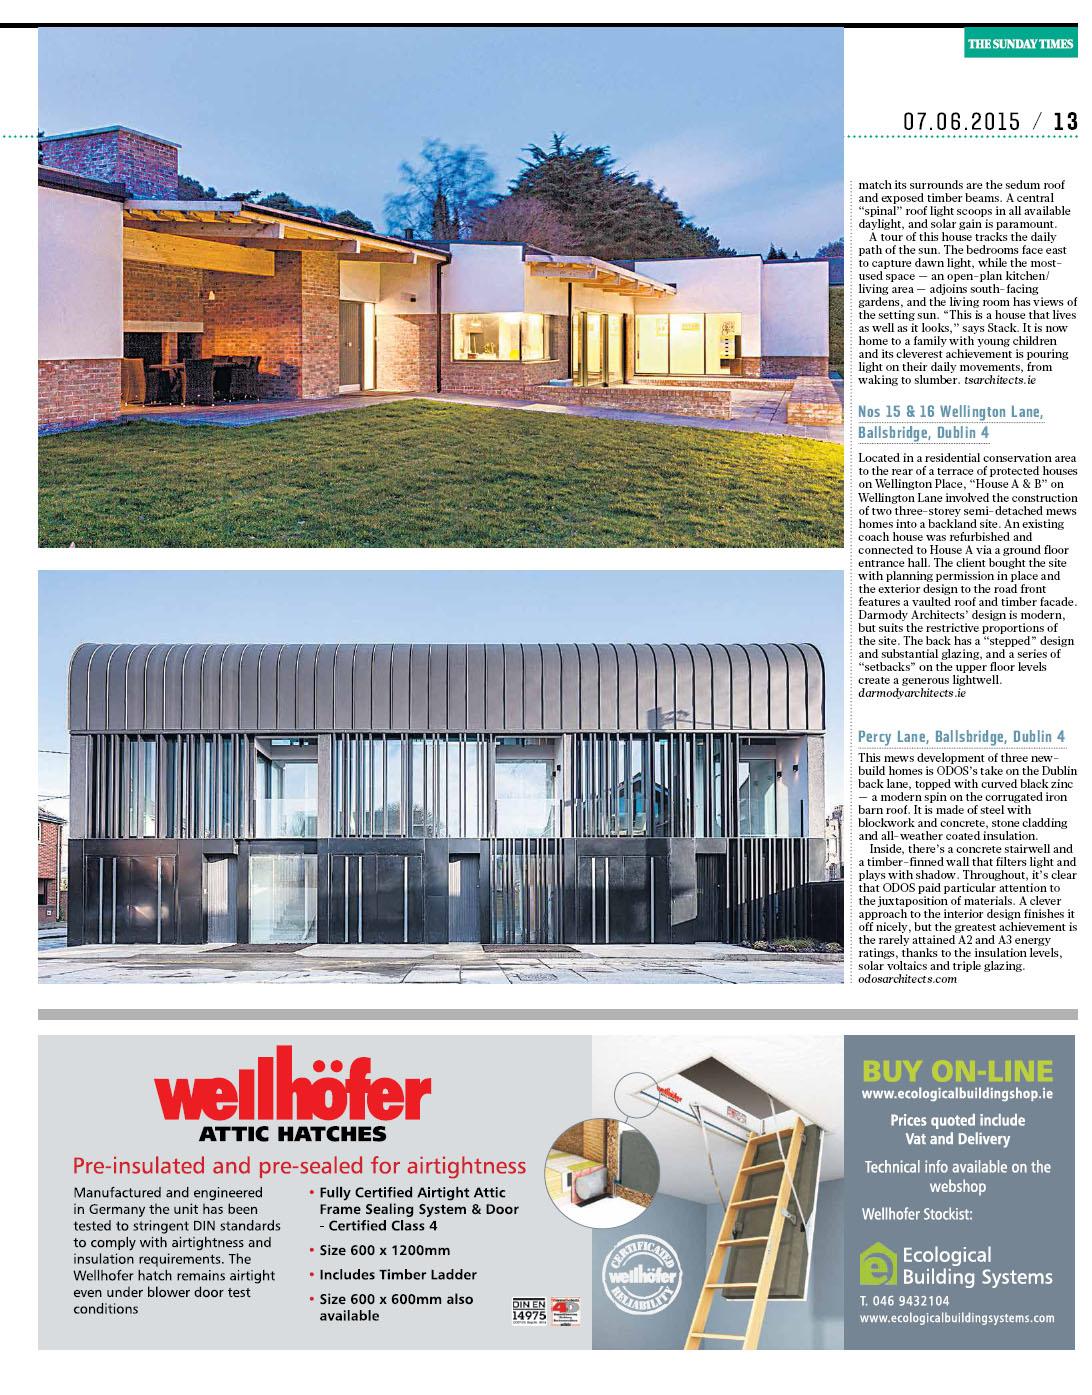 Sunday Times page 5.jpg